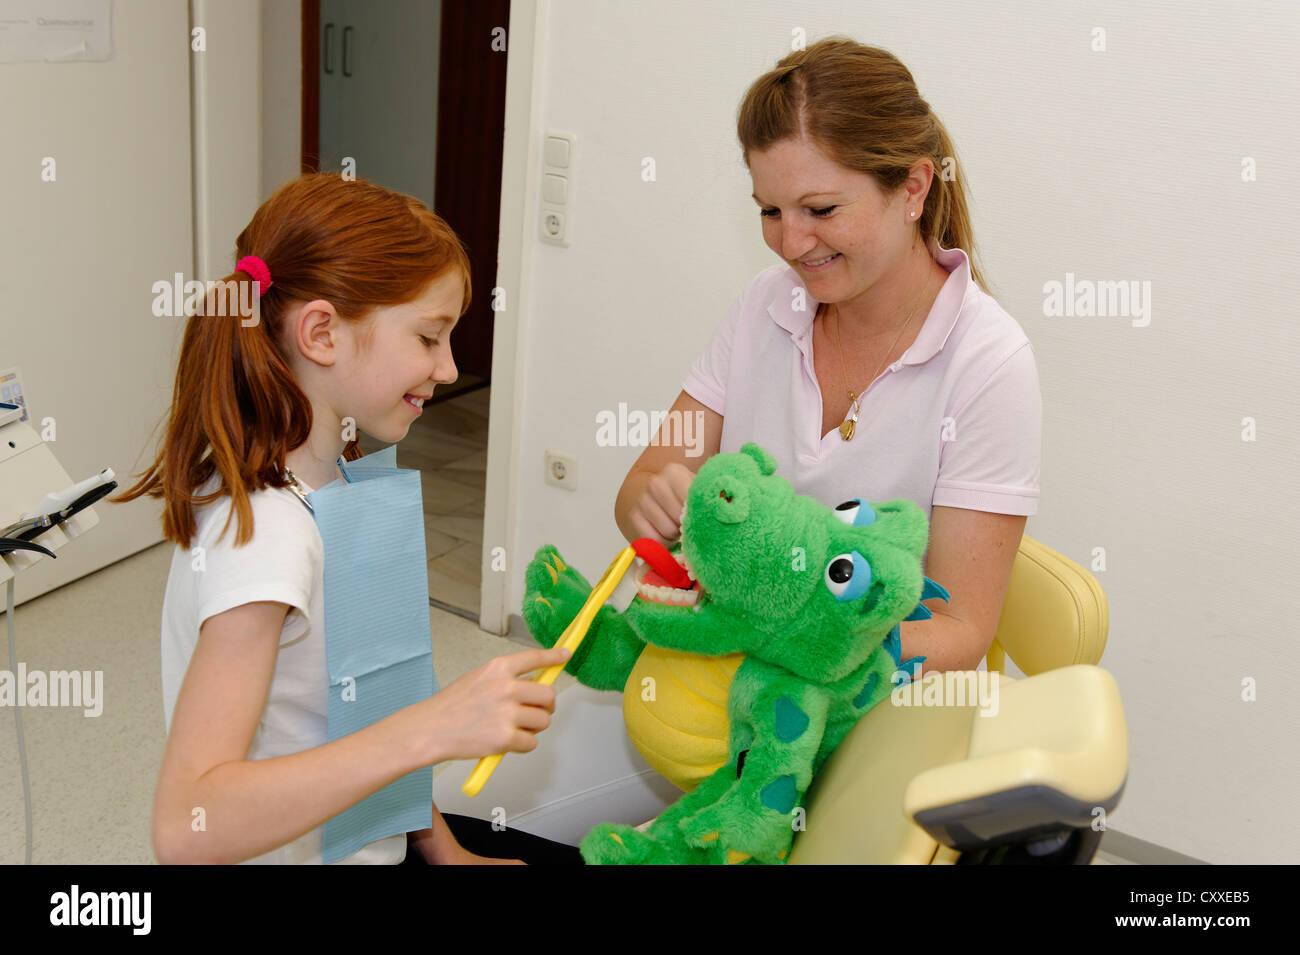 Girl at the dentist's, receiving instructions for dental care on a model, dental hygiene, dental care, dental - Stock Image